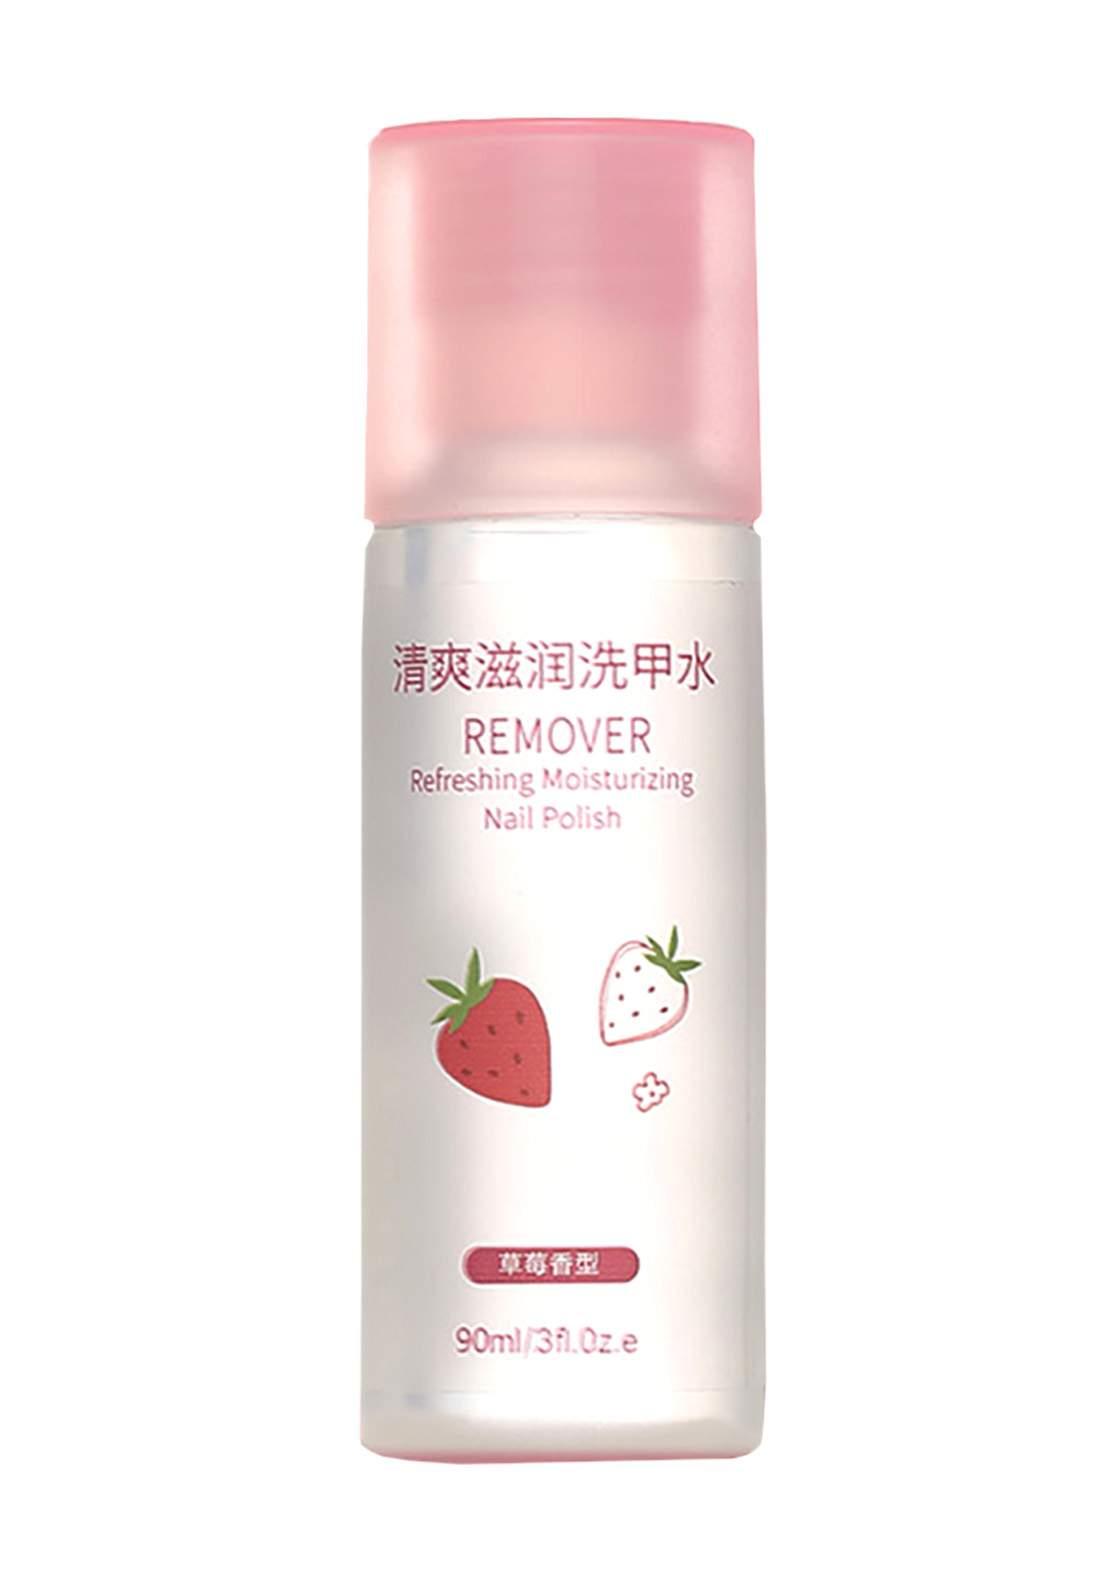 Nail polish remover spray 90 ml  مزيل طلاء الاظافر